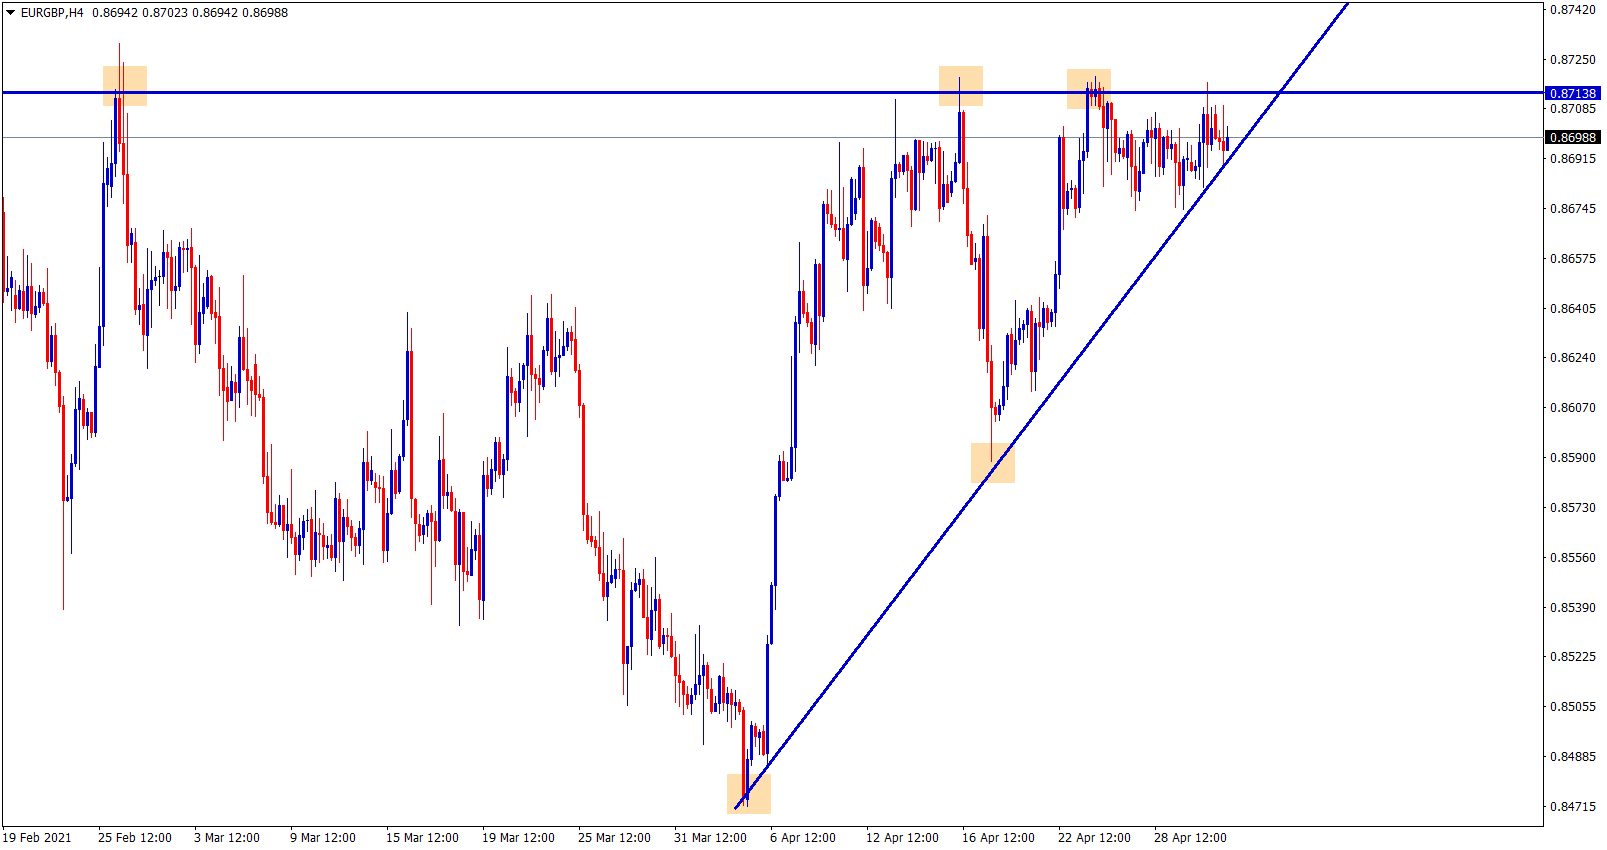 EURGBP Ascending Triangle waiting to break